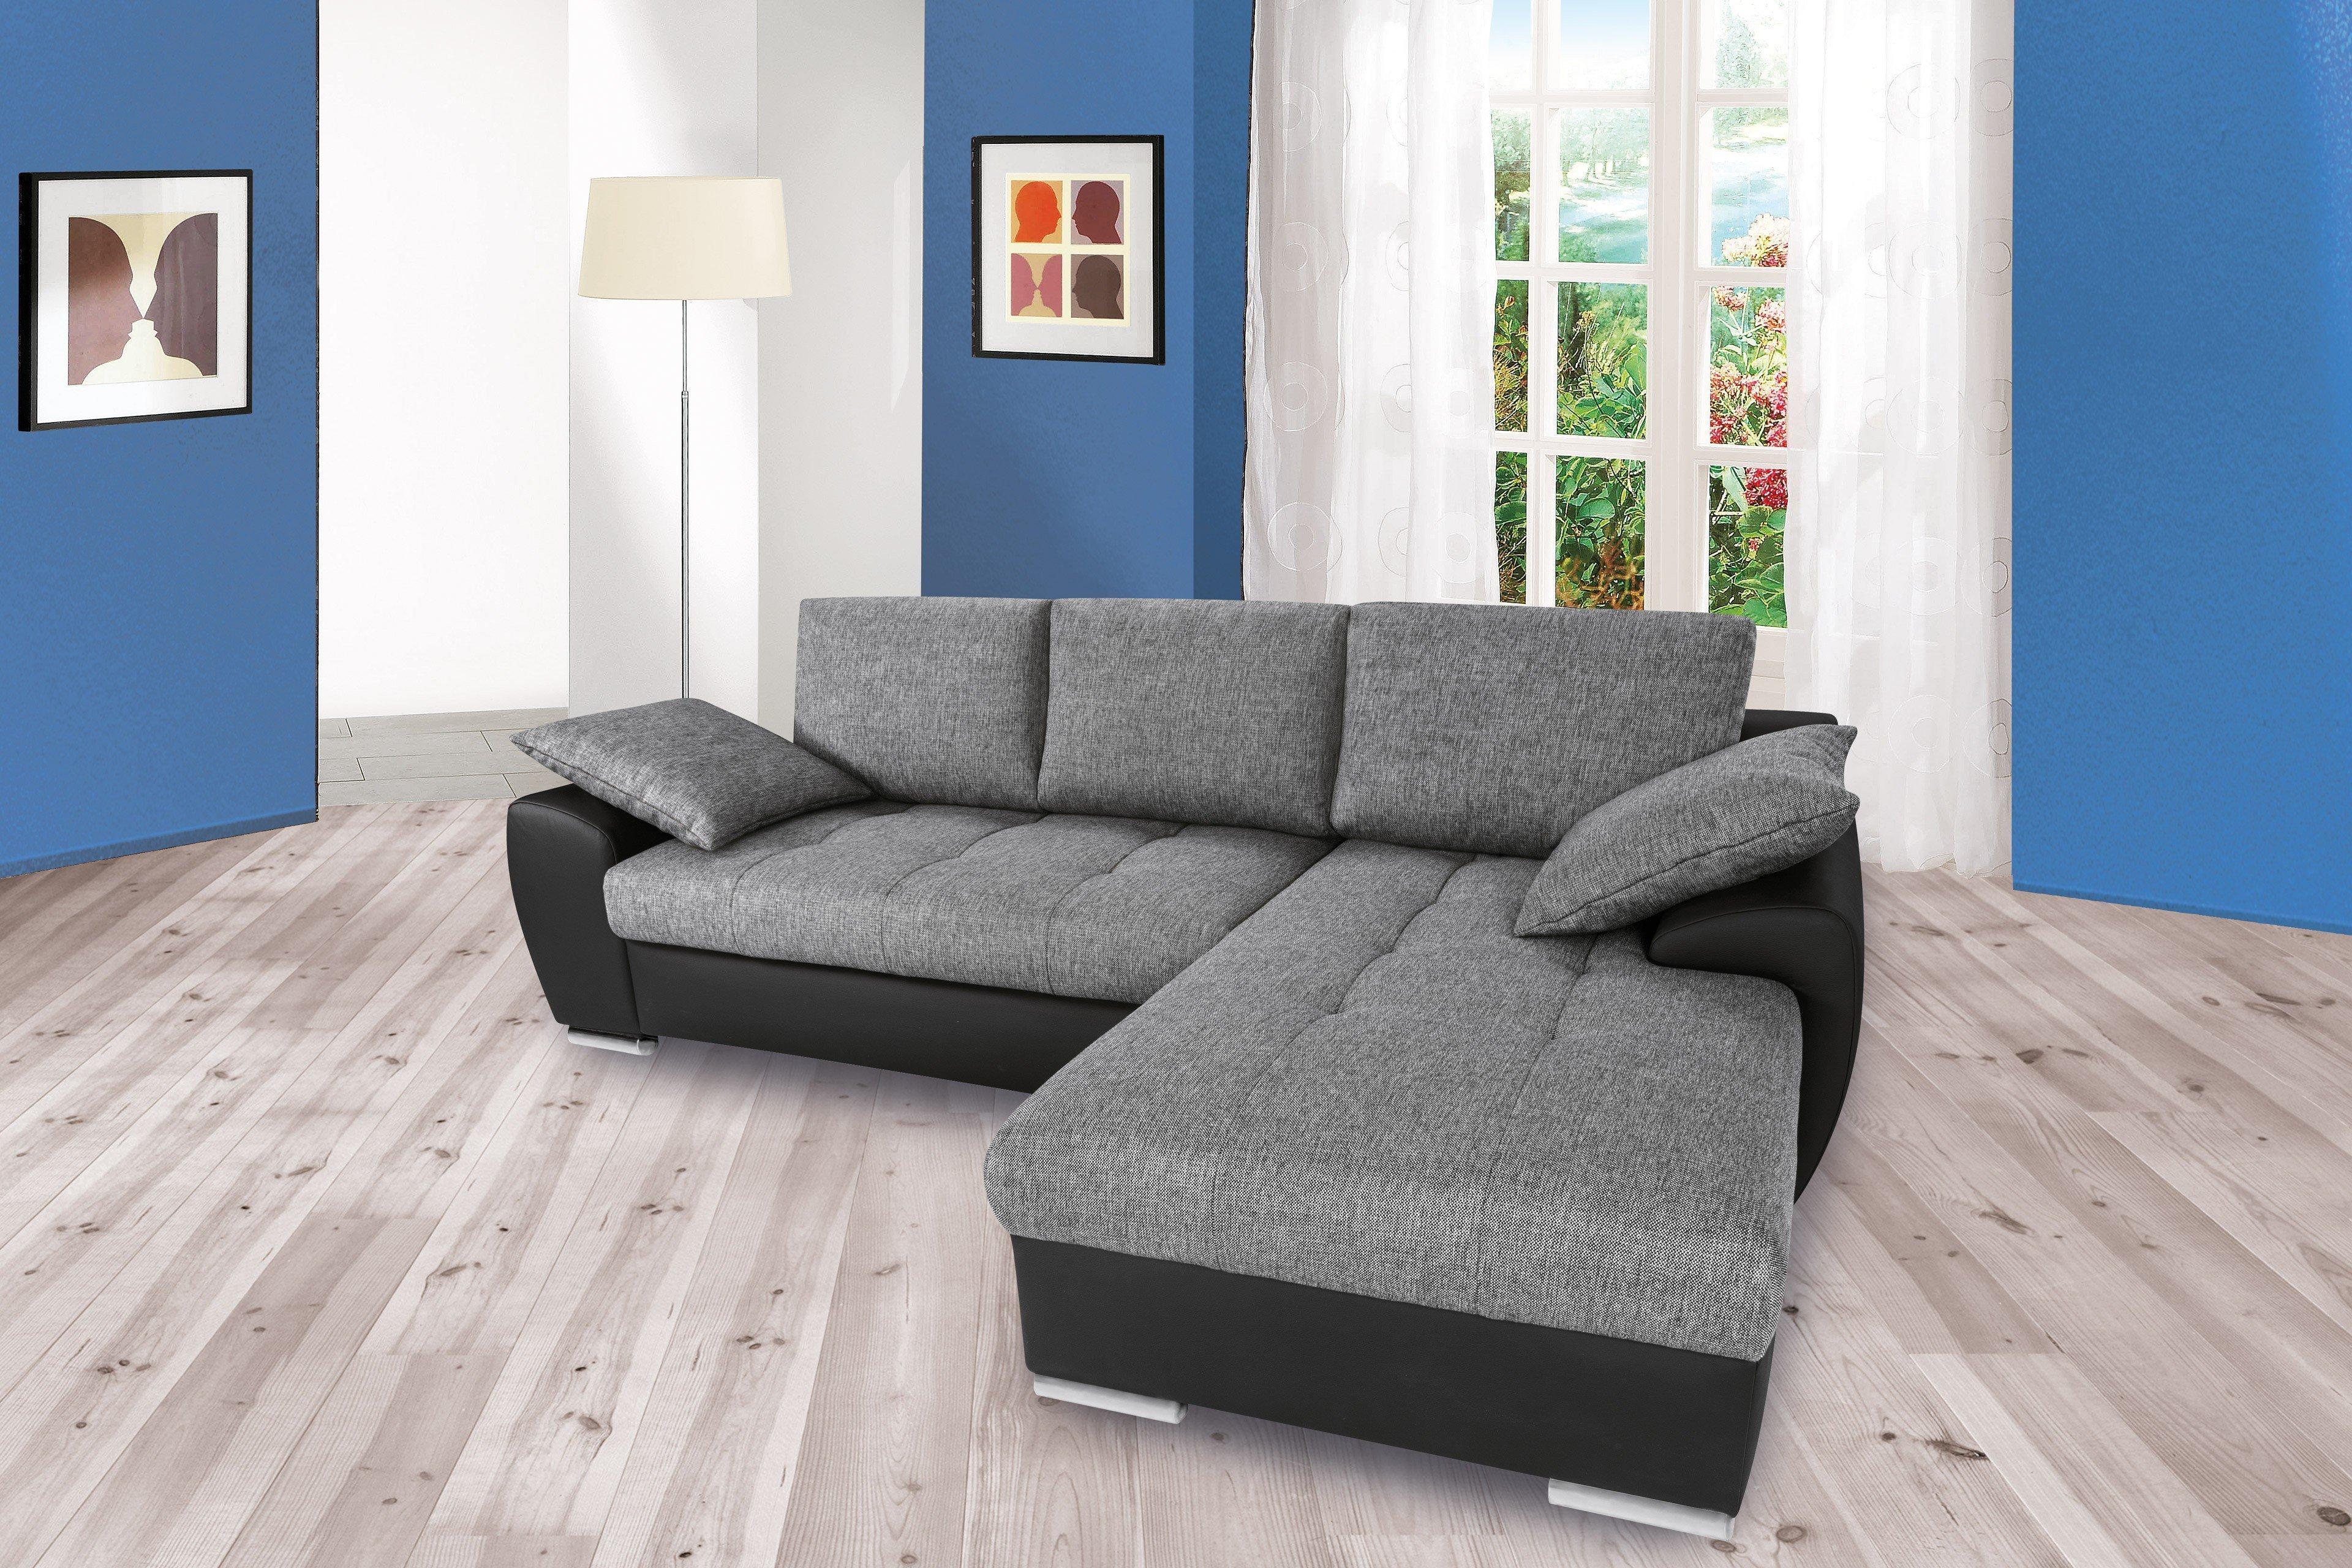 nova via madrid polsterecke grau schwarz m bel letz ihr online shop. Black Bedroom Furniture Sets. Home Design Ideas